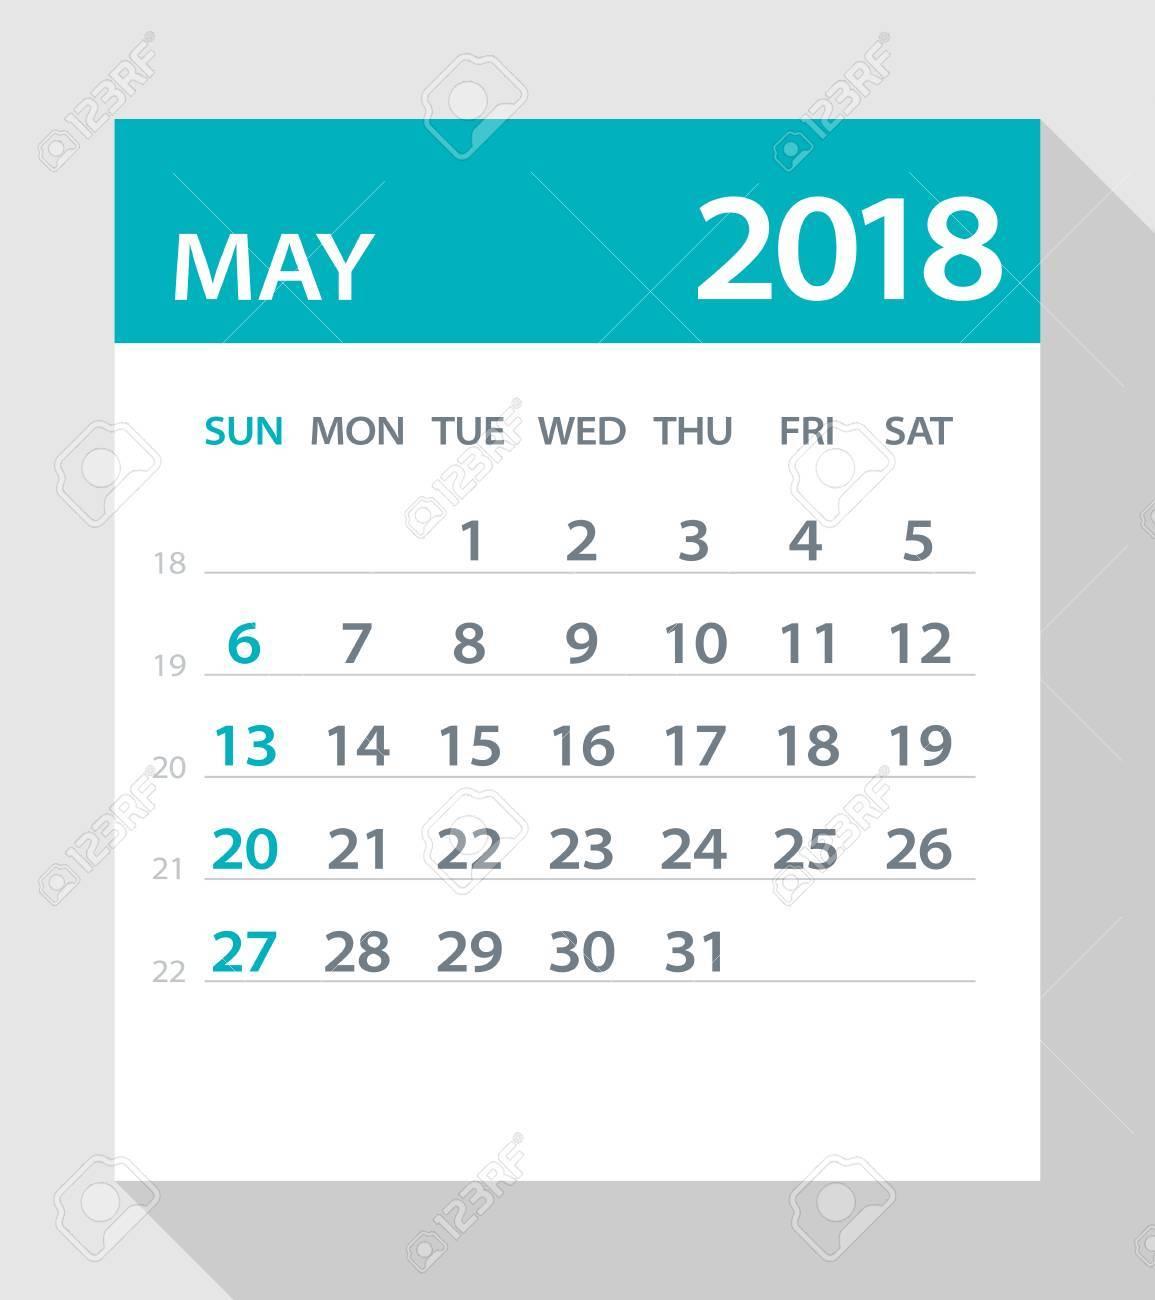 may 2018 calendar leaf vector illustration stock vector 80602299